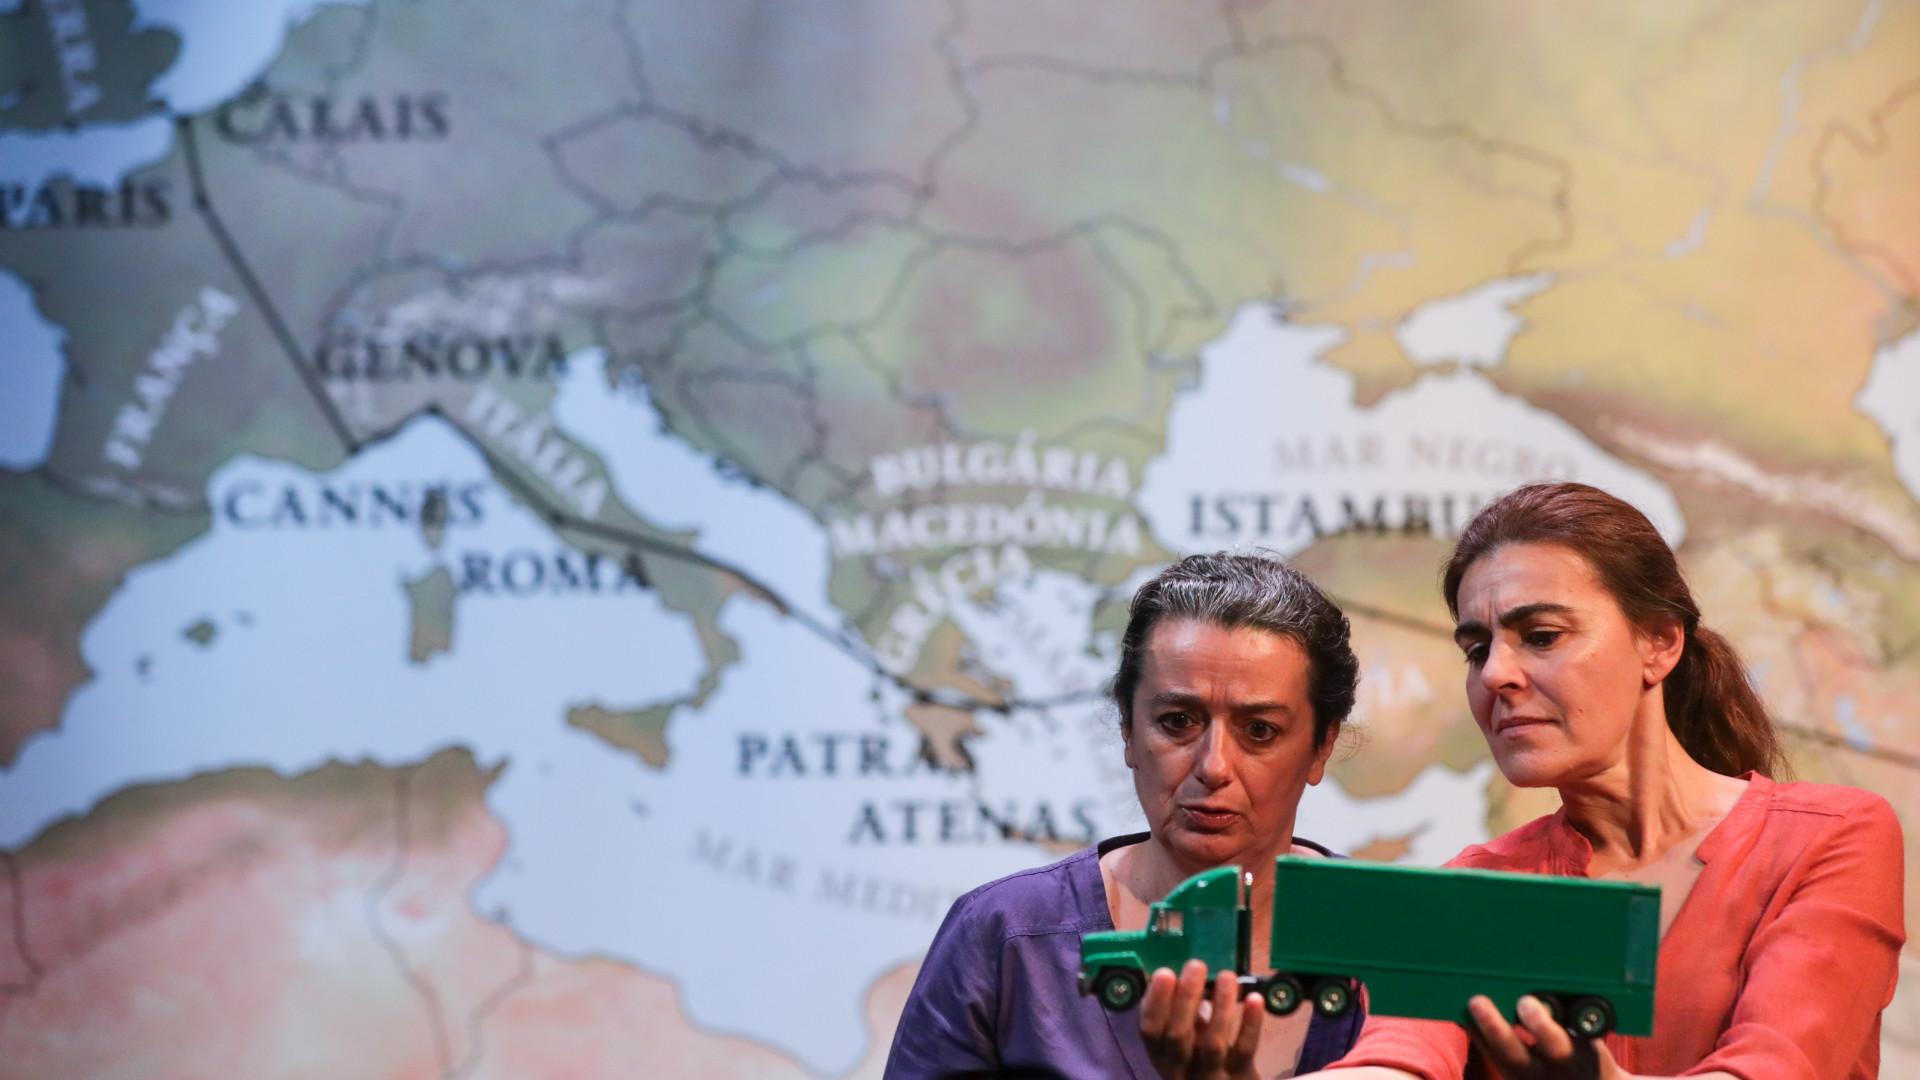 'Do bosque para o mundo' regressa terça-feira ao Teatro S. Luiz